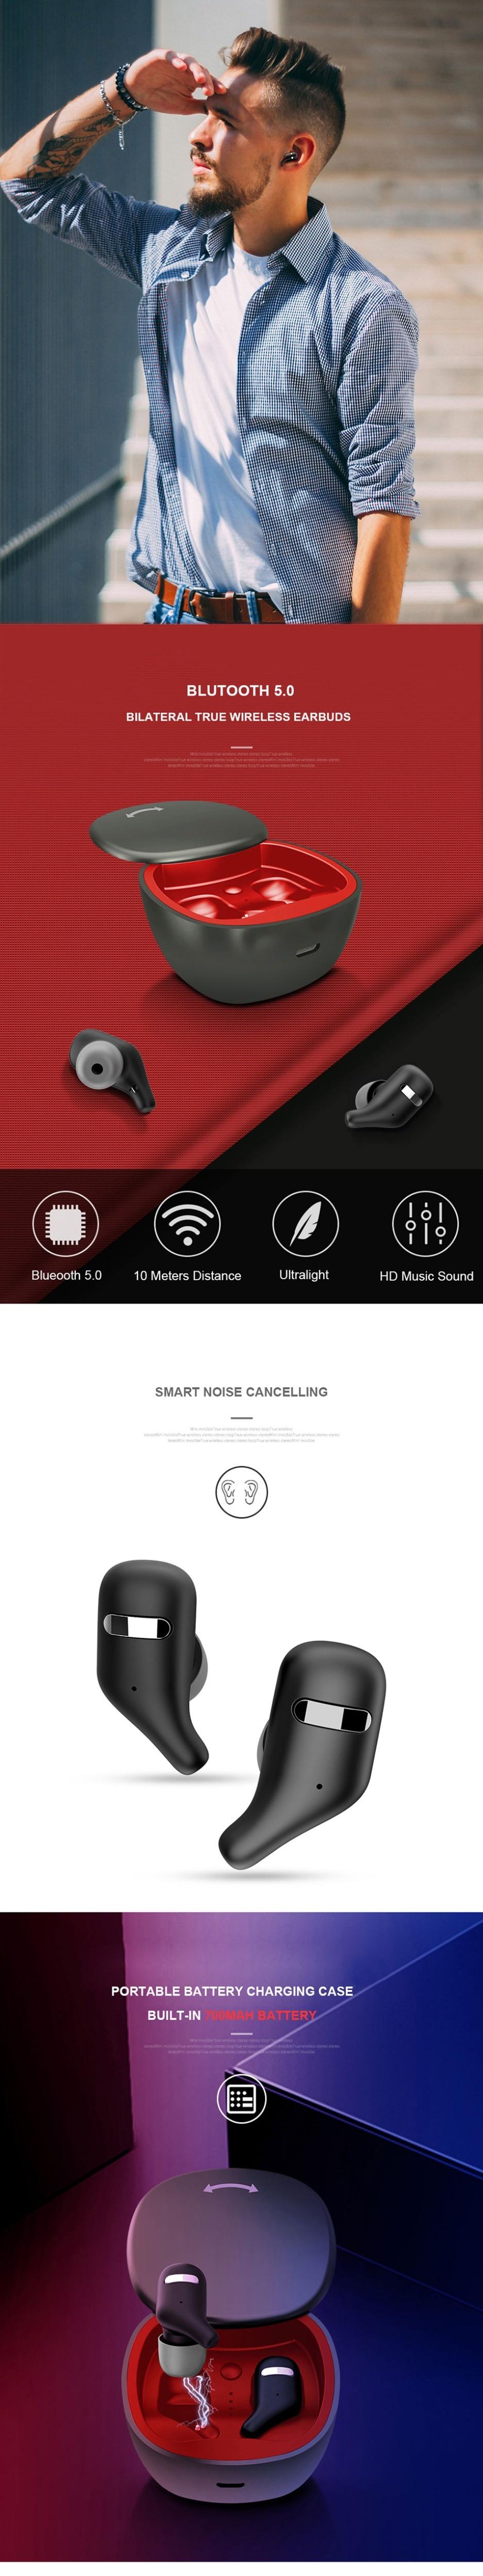 Volemer A2 Tws Bluetooth Earphone Wireless Sports Headset Auto Pairing Bluetooth Earphone Binaural HD Call Hifi Wireless Earbuds (1)